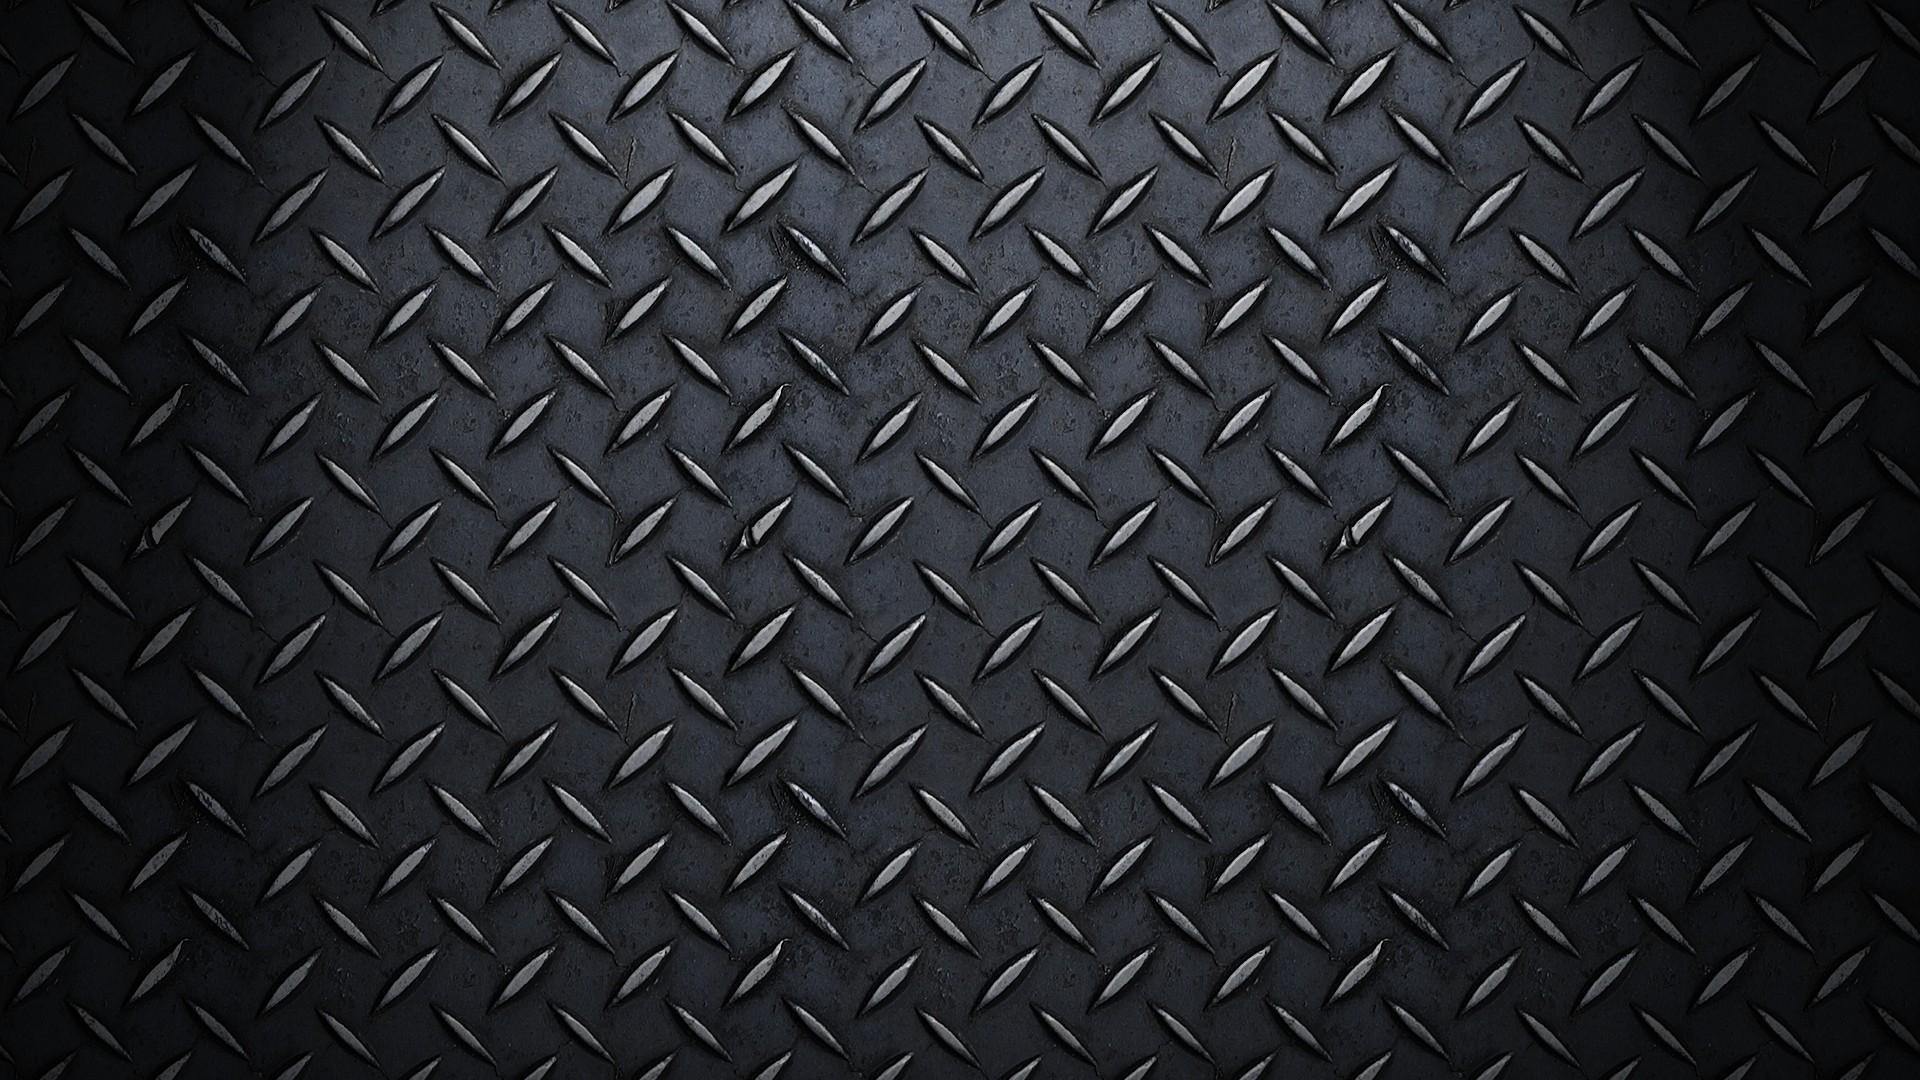 Fondos de pantalla negro patr n textura circulo neum tico material dise o piso l nea - Tire tread wallpaper ...